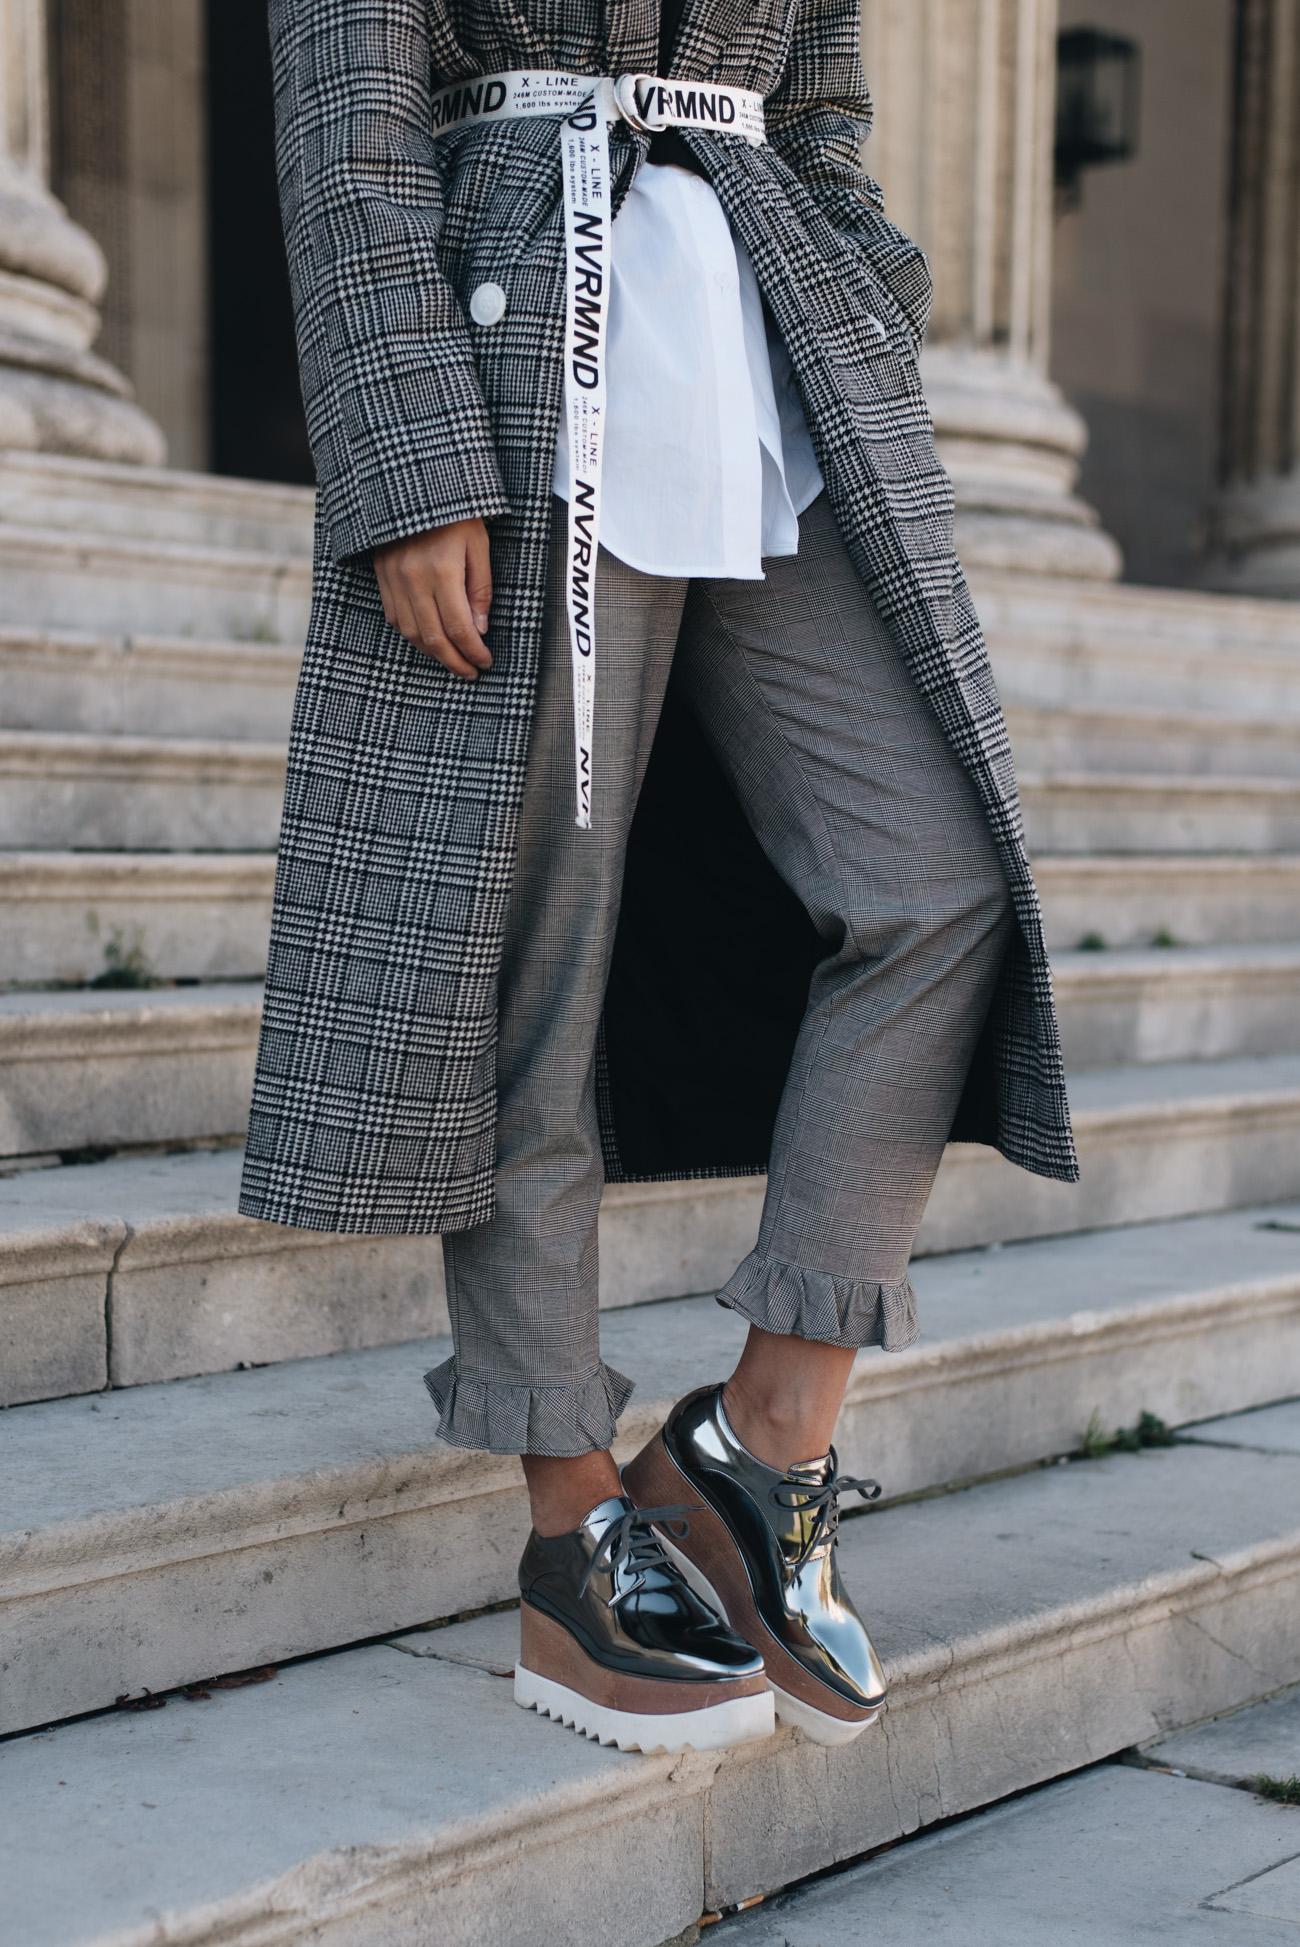 glencheck muster grau wei bluse mit corsage fashion - Glencheck Muster